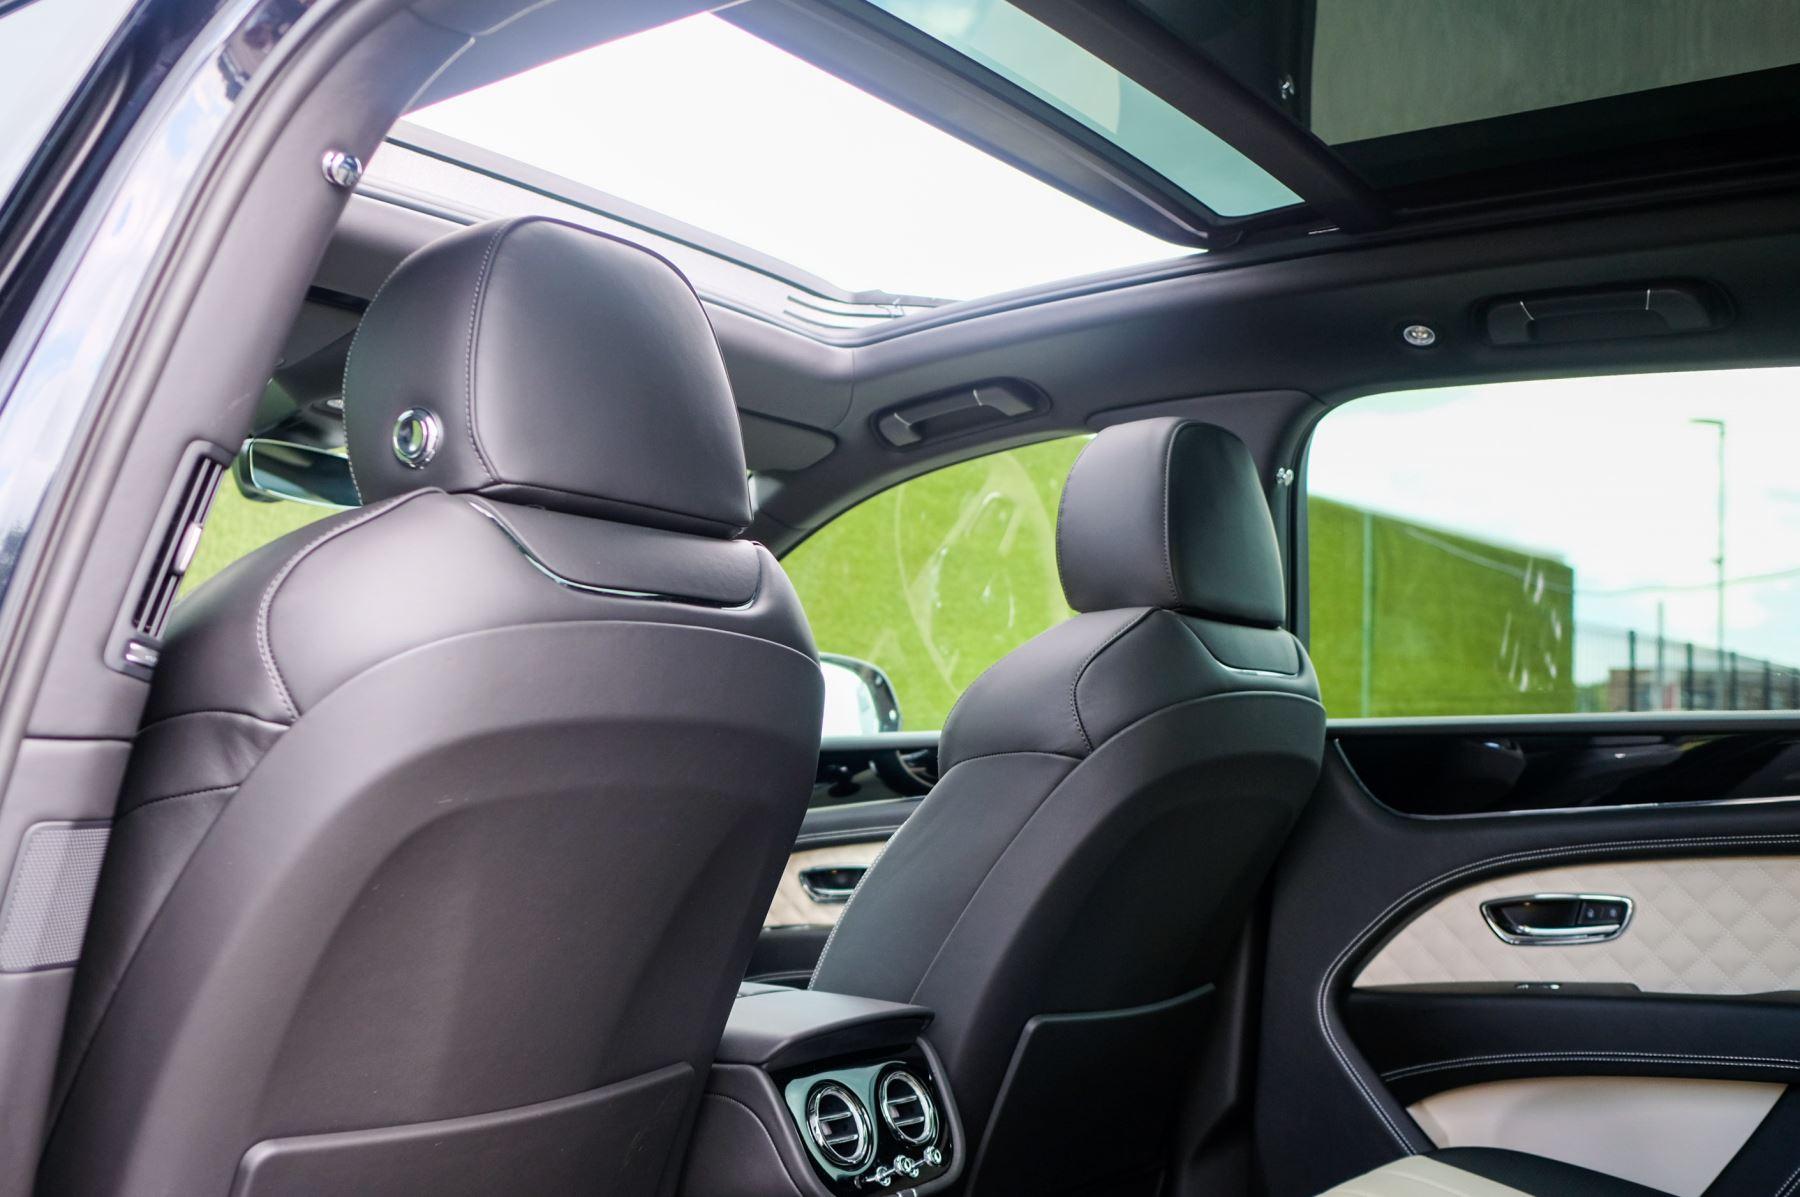 Bentley Bentayga 4.0 V8 - Mulliner Driving Specification for Black Specification image 14